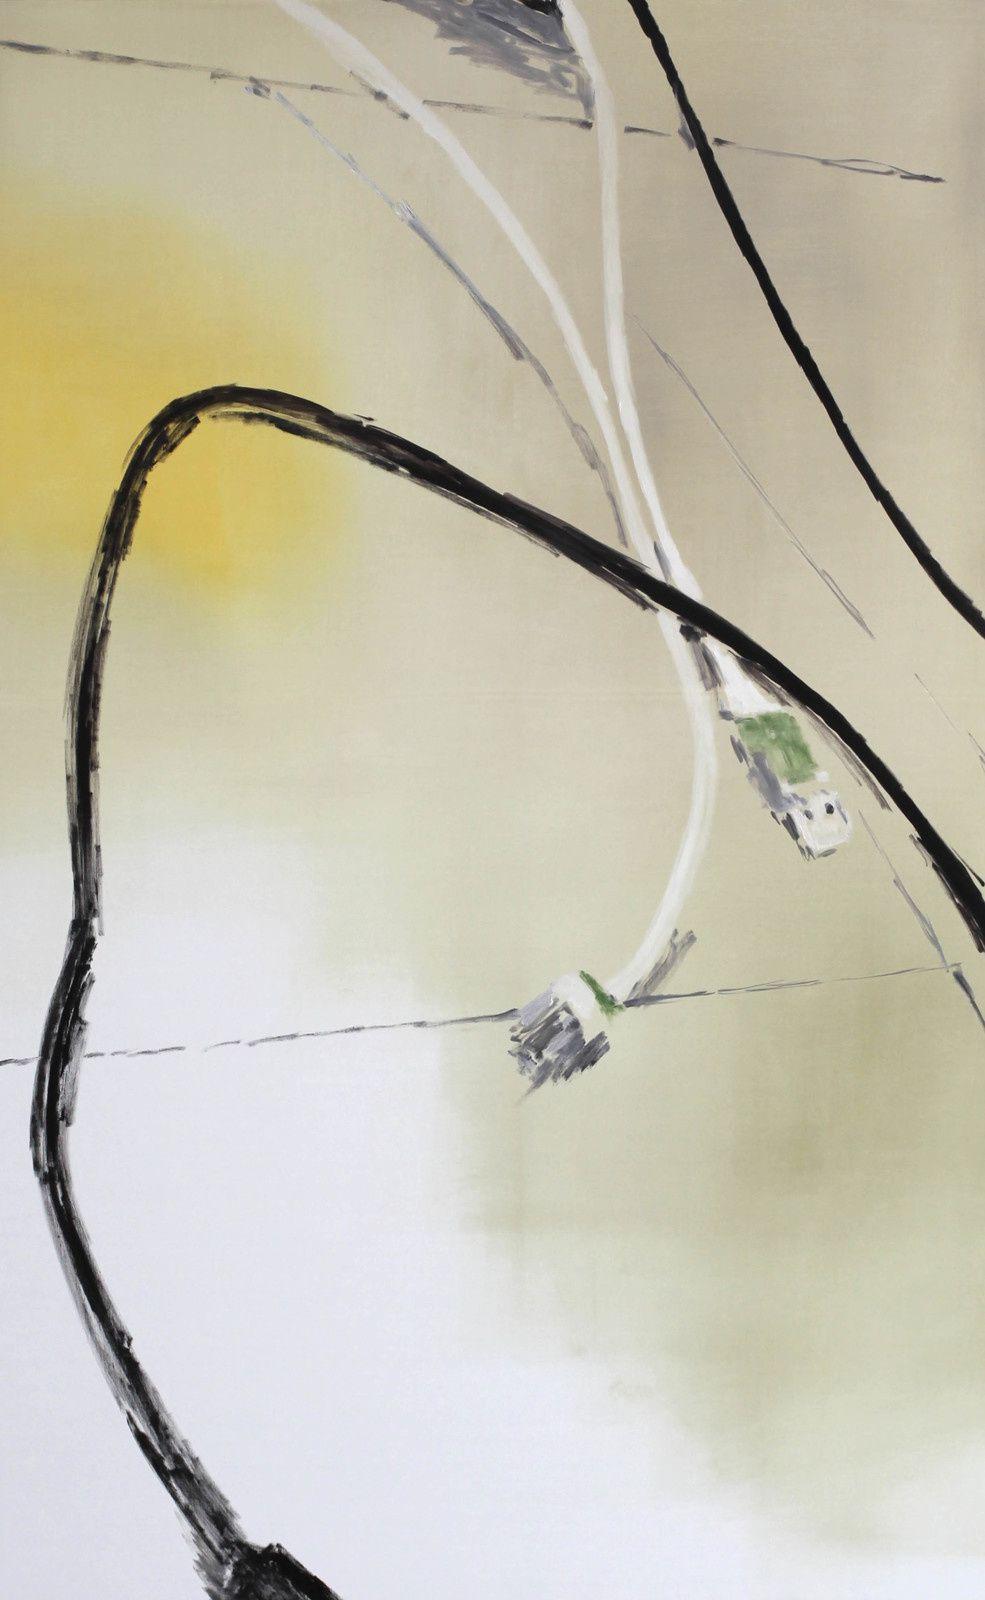 """Untitled V"", 2008 de Miltos MANETAS - Courtesy Galerie Hussenot © Photo Éric Simon"